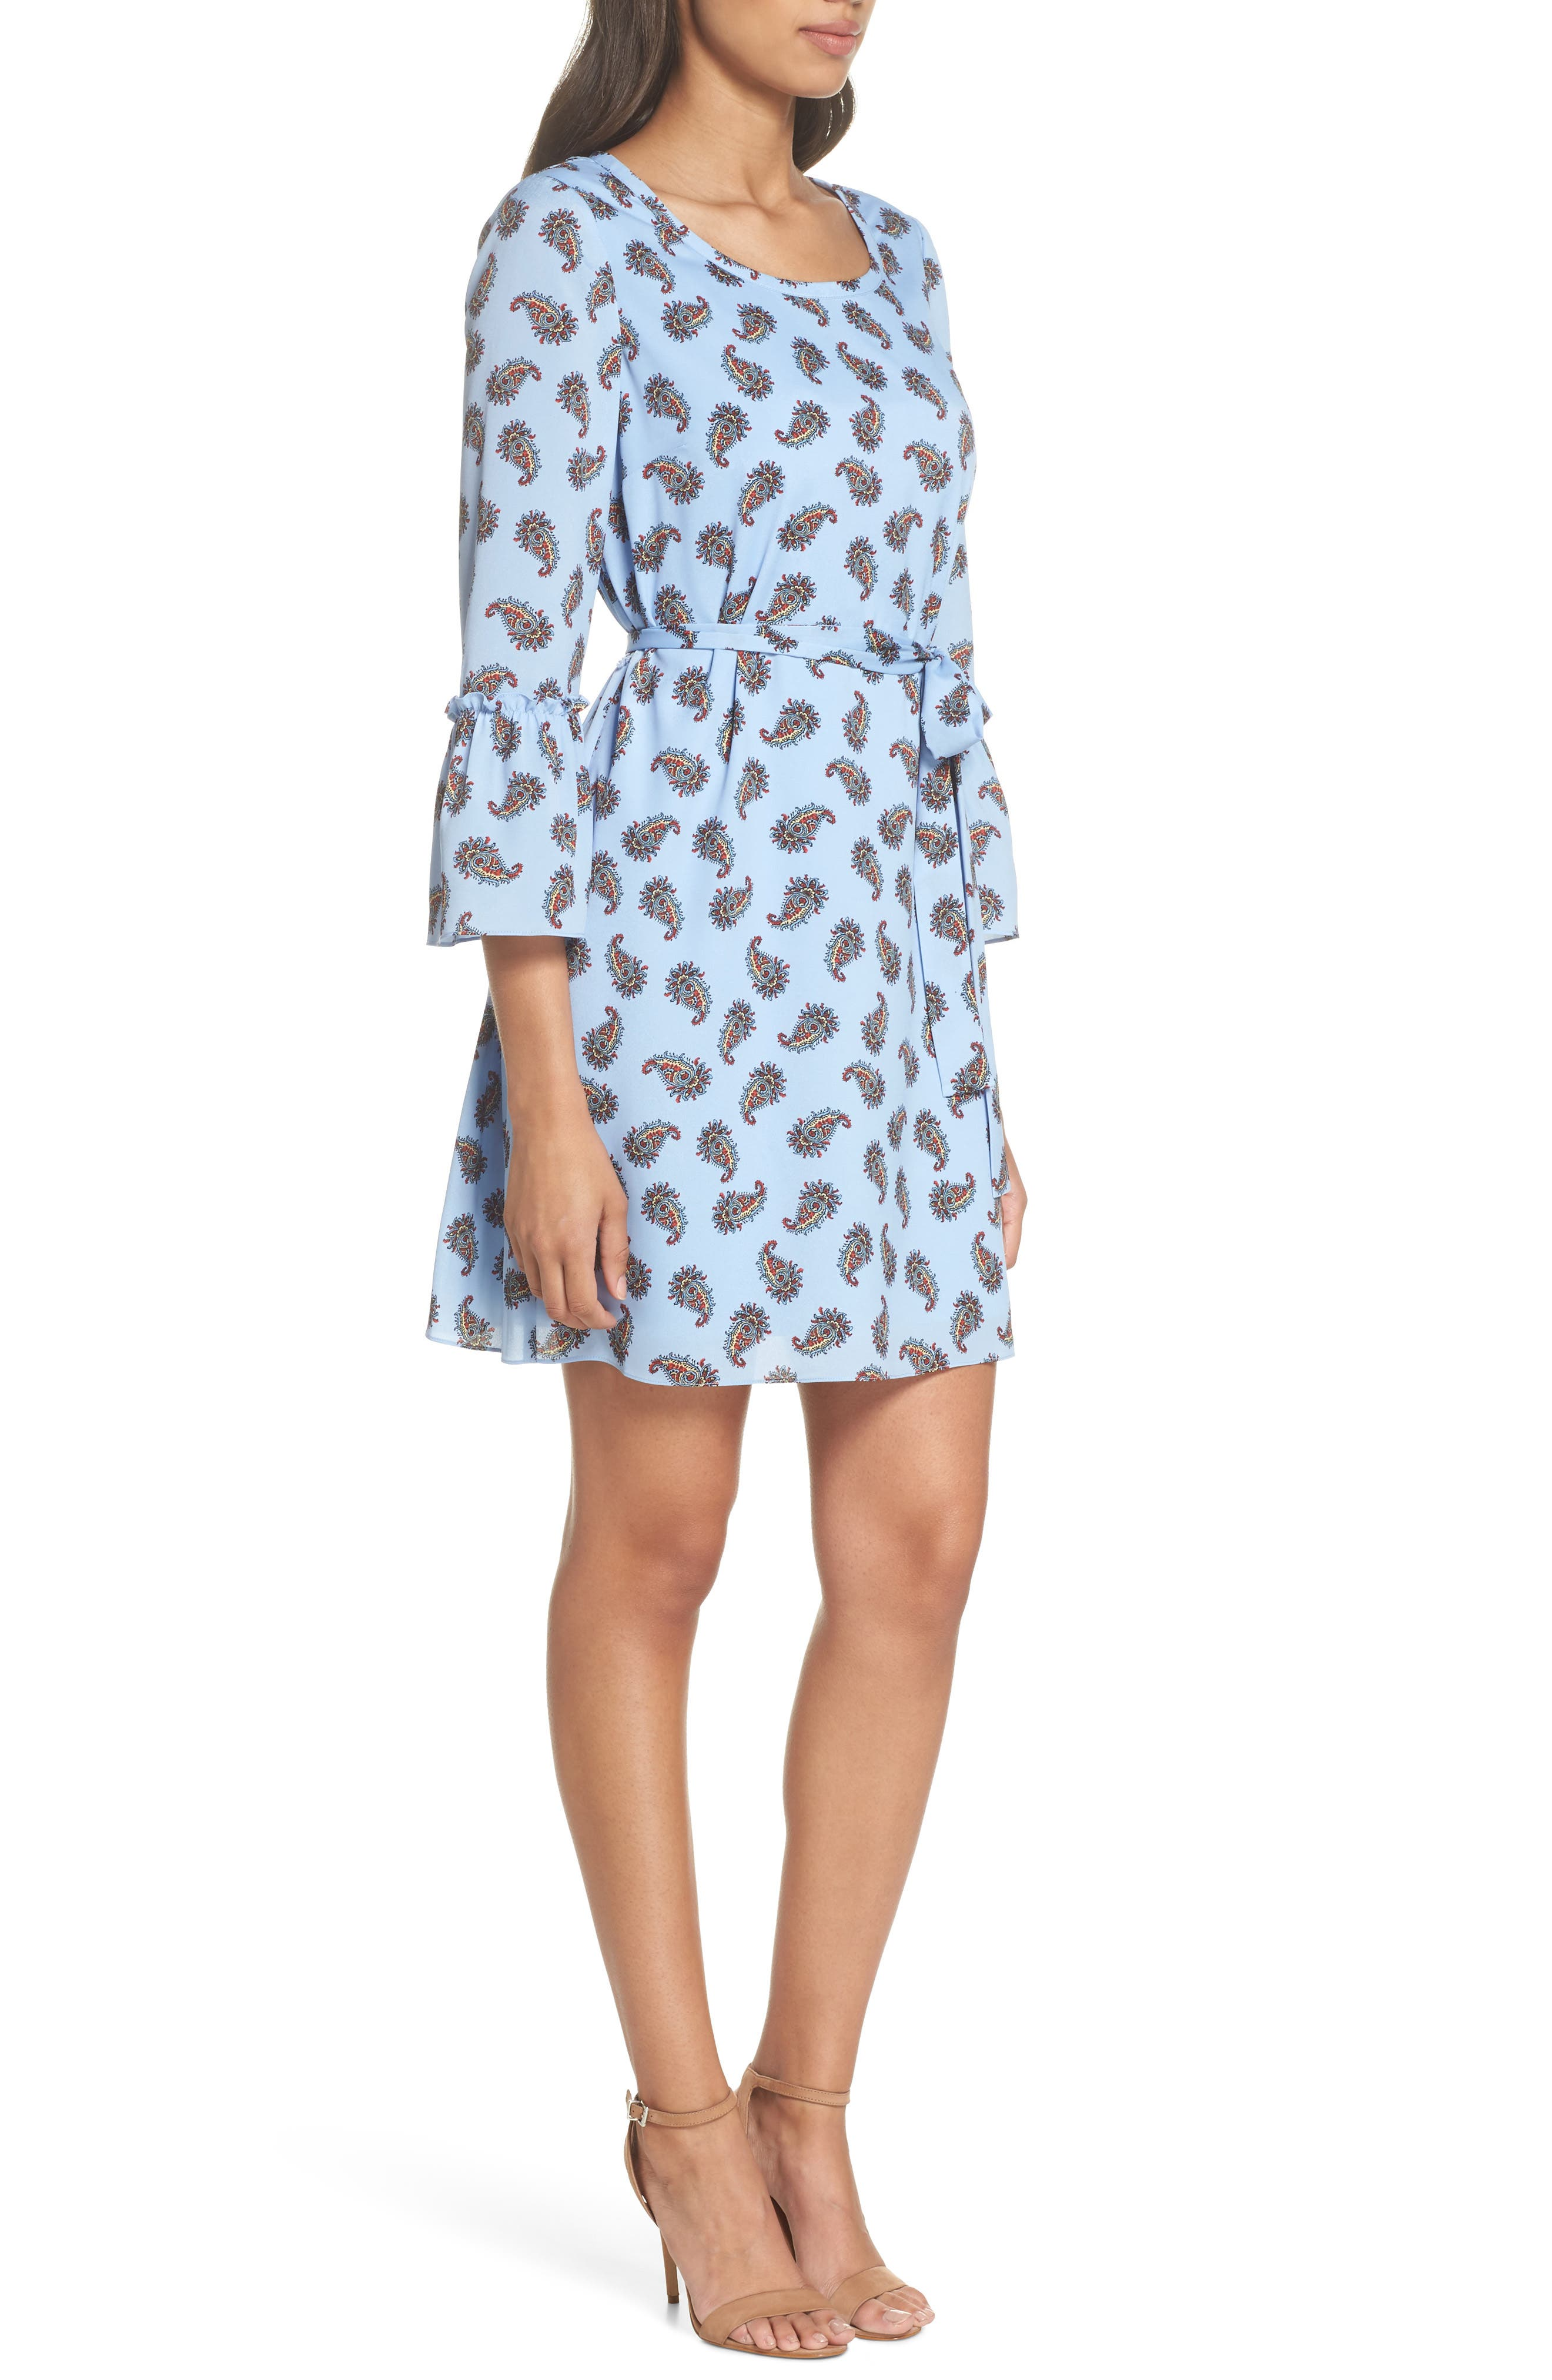 Orli Paisley Print Bell Sleeve Dress,                             Alternate thumbnail 3, color,                             Blue Multi